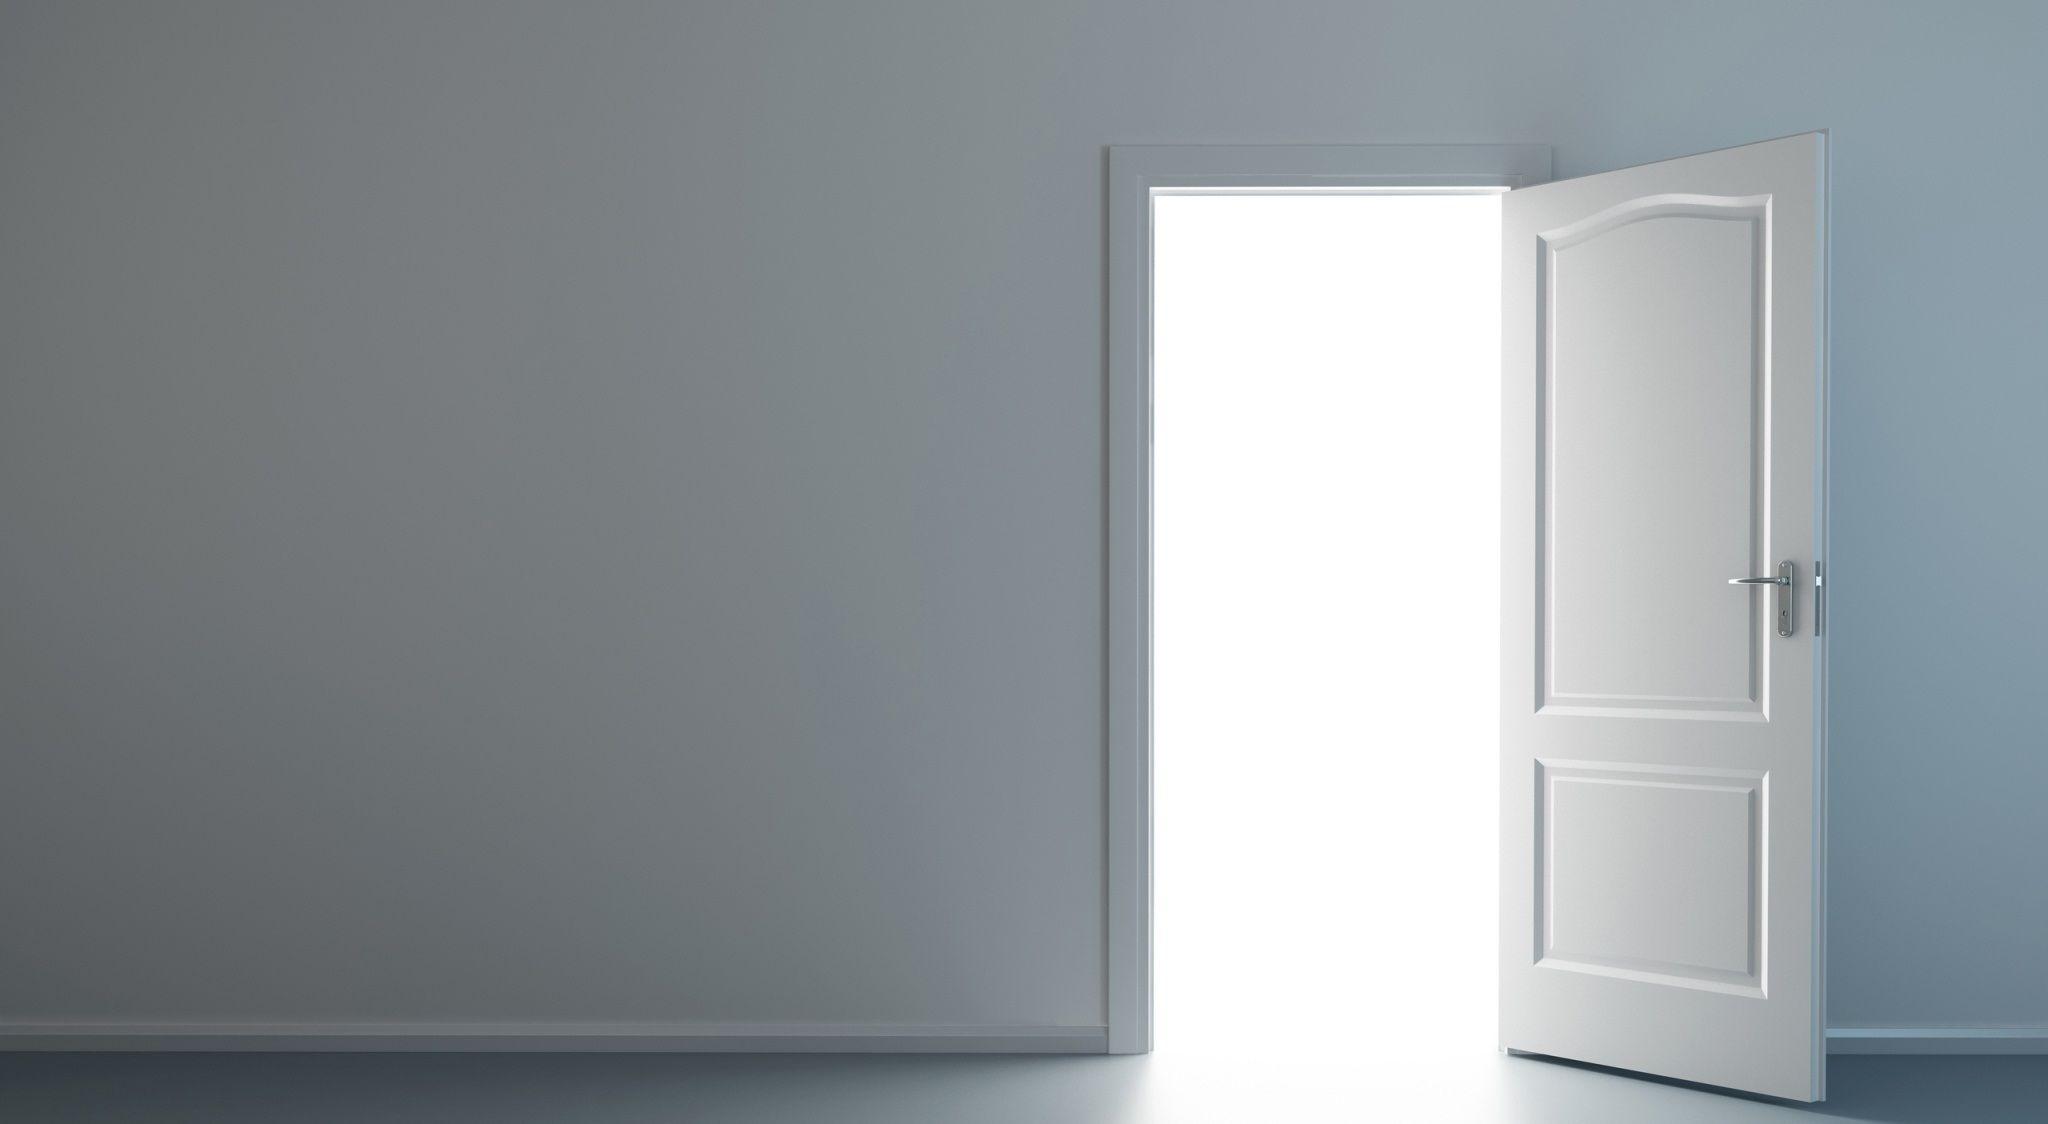 Open Door In A White Empty Room Hd Wallpaper Decoracion Hogar